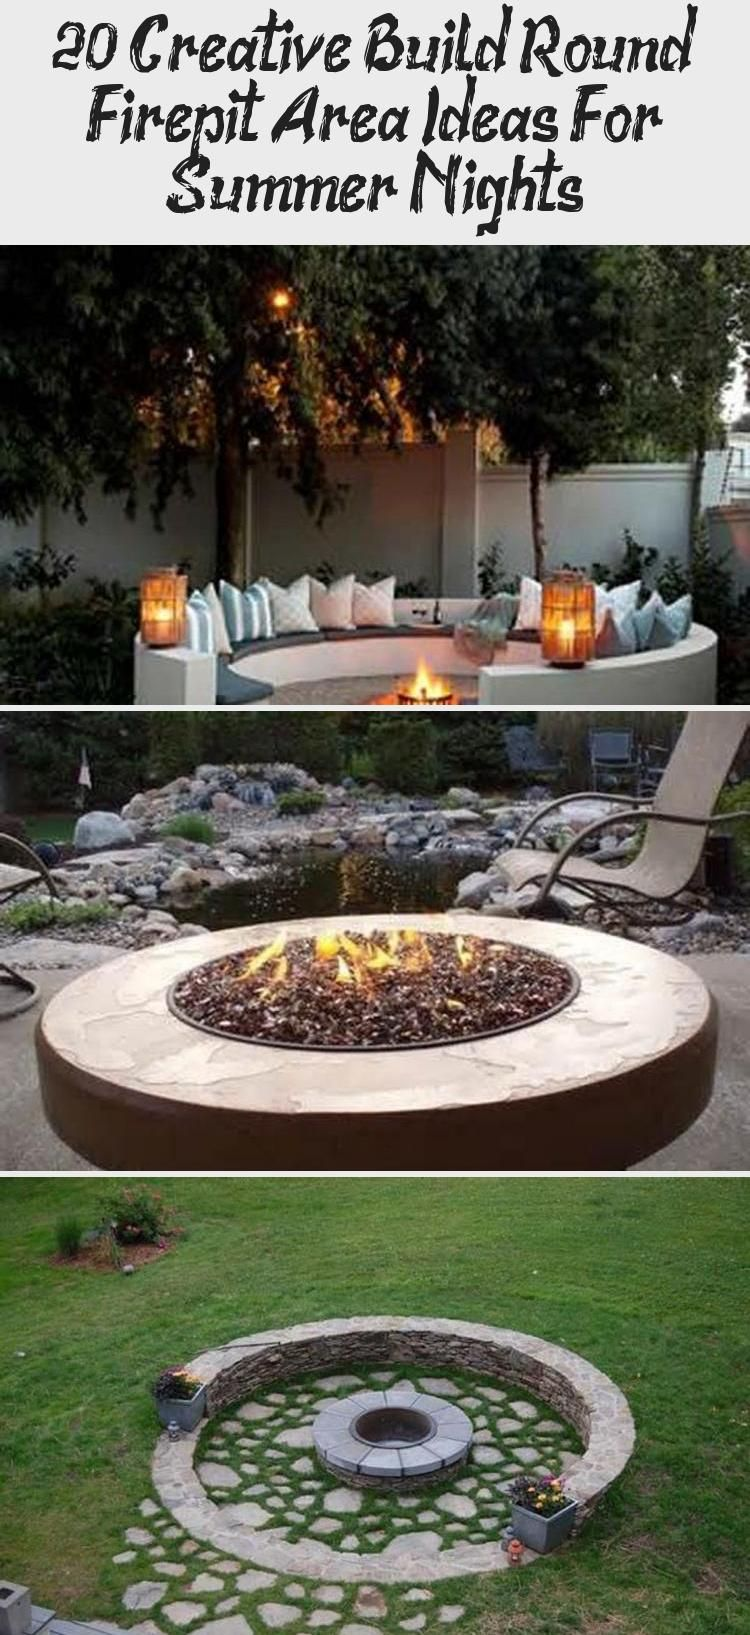 My Blog En Blog In 2020 Fire Pit Area Garden Room Night Garden